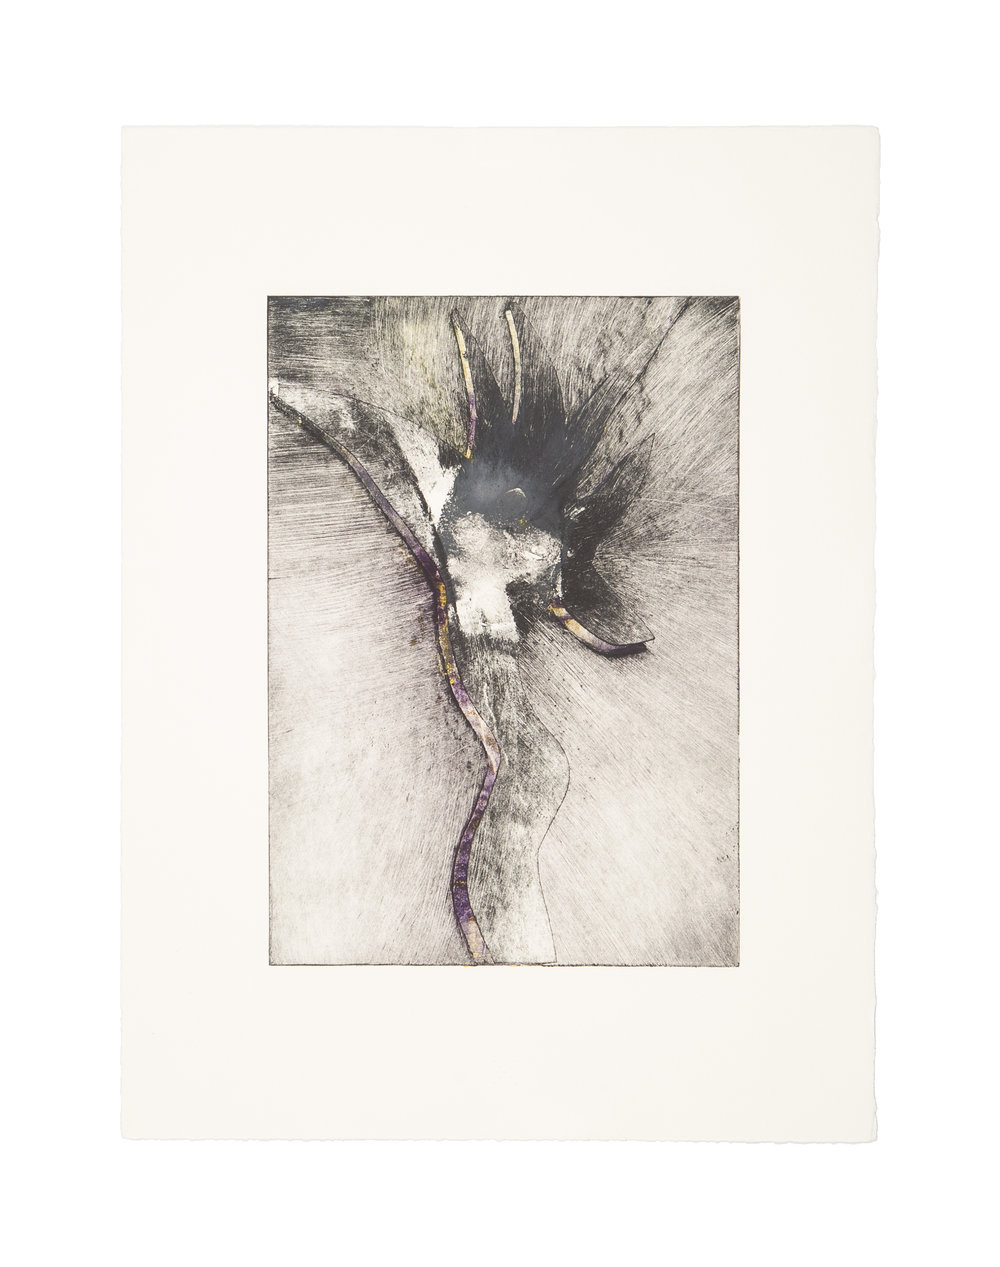 THE NYMPH  Monoprint/intaglio  Image: 7 x 9.9 inches  Paper: 11.25 x 15 inches  © 2008 Carol Morrison